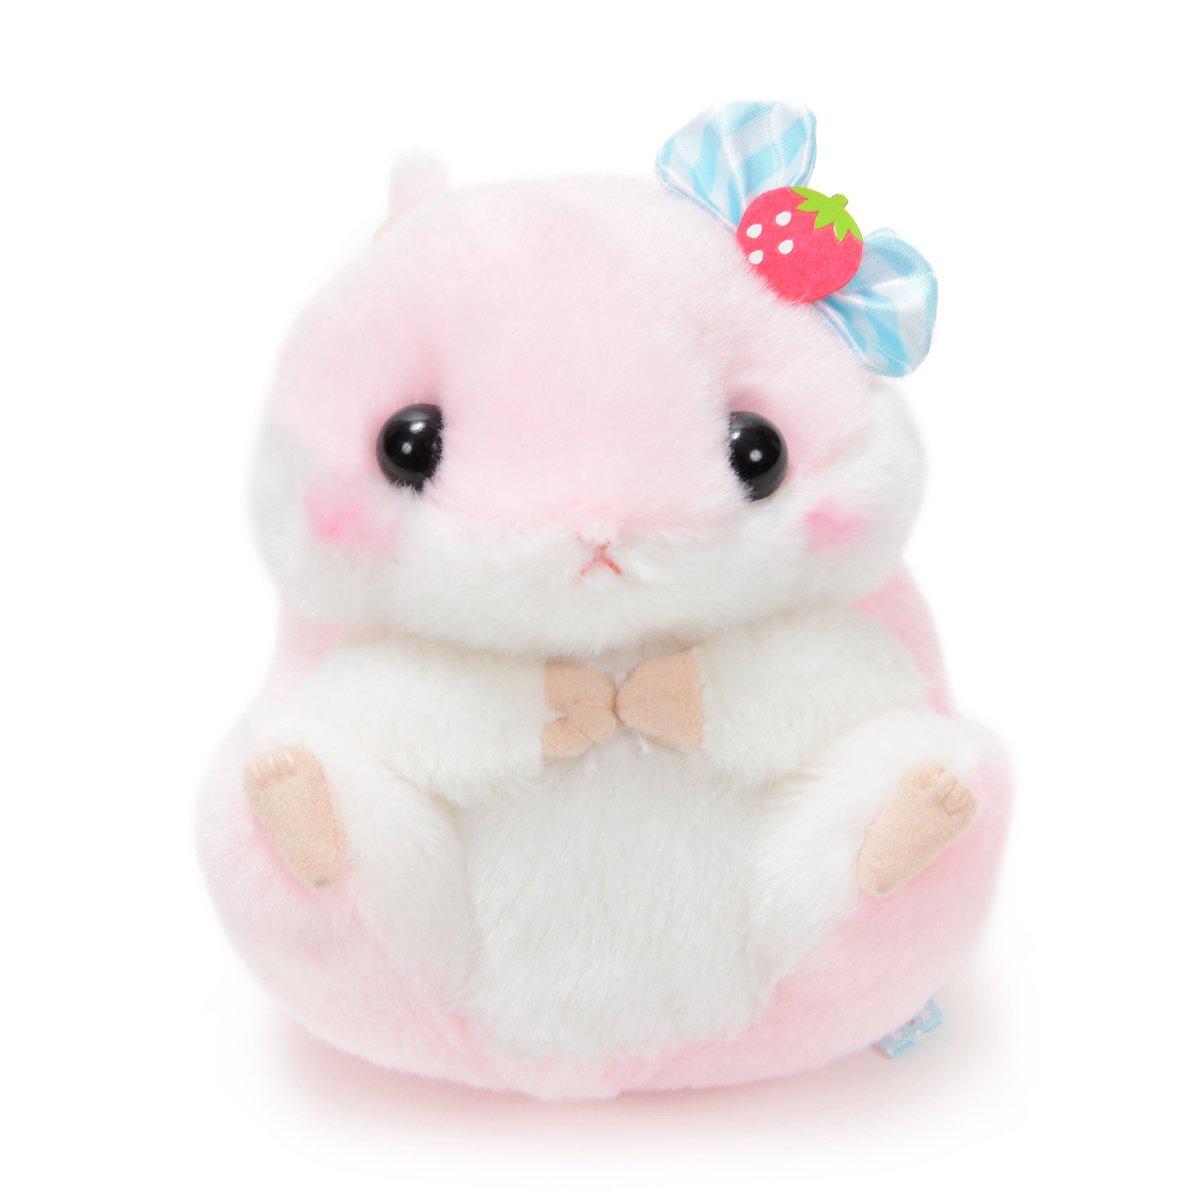 Plush Hamster, Amuse, Coroham Coron, Ichigo Hamster Plush Collection Momo-chan Pink, 5 Inches